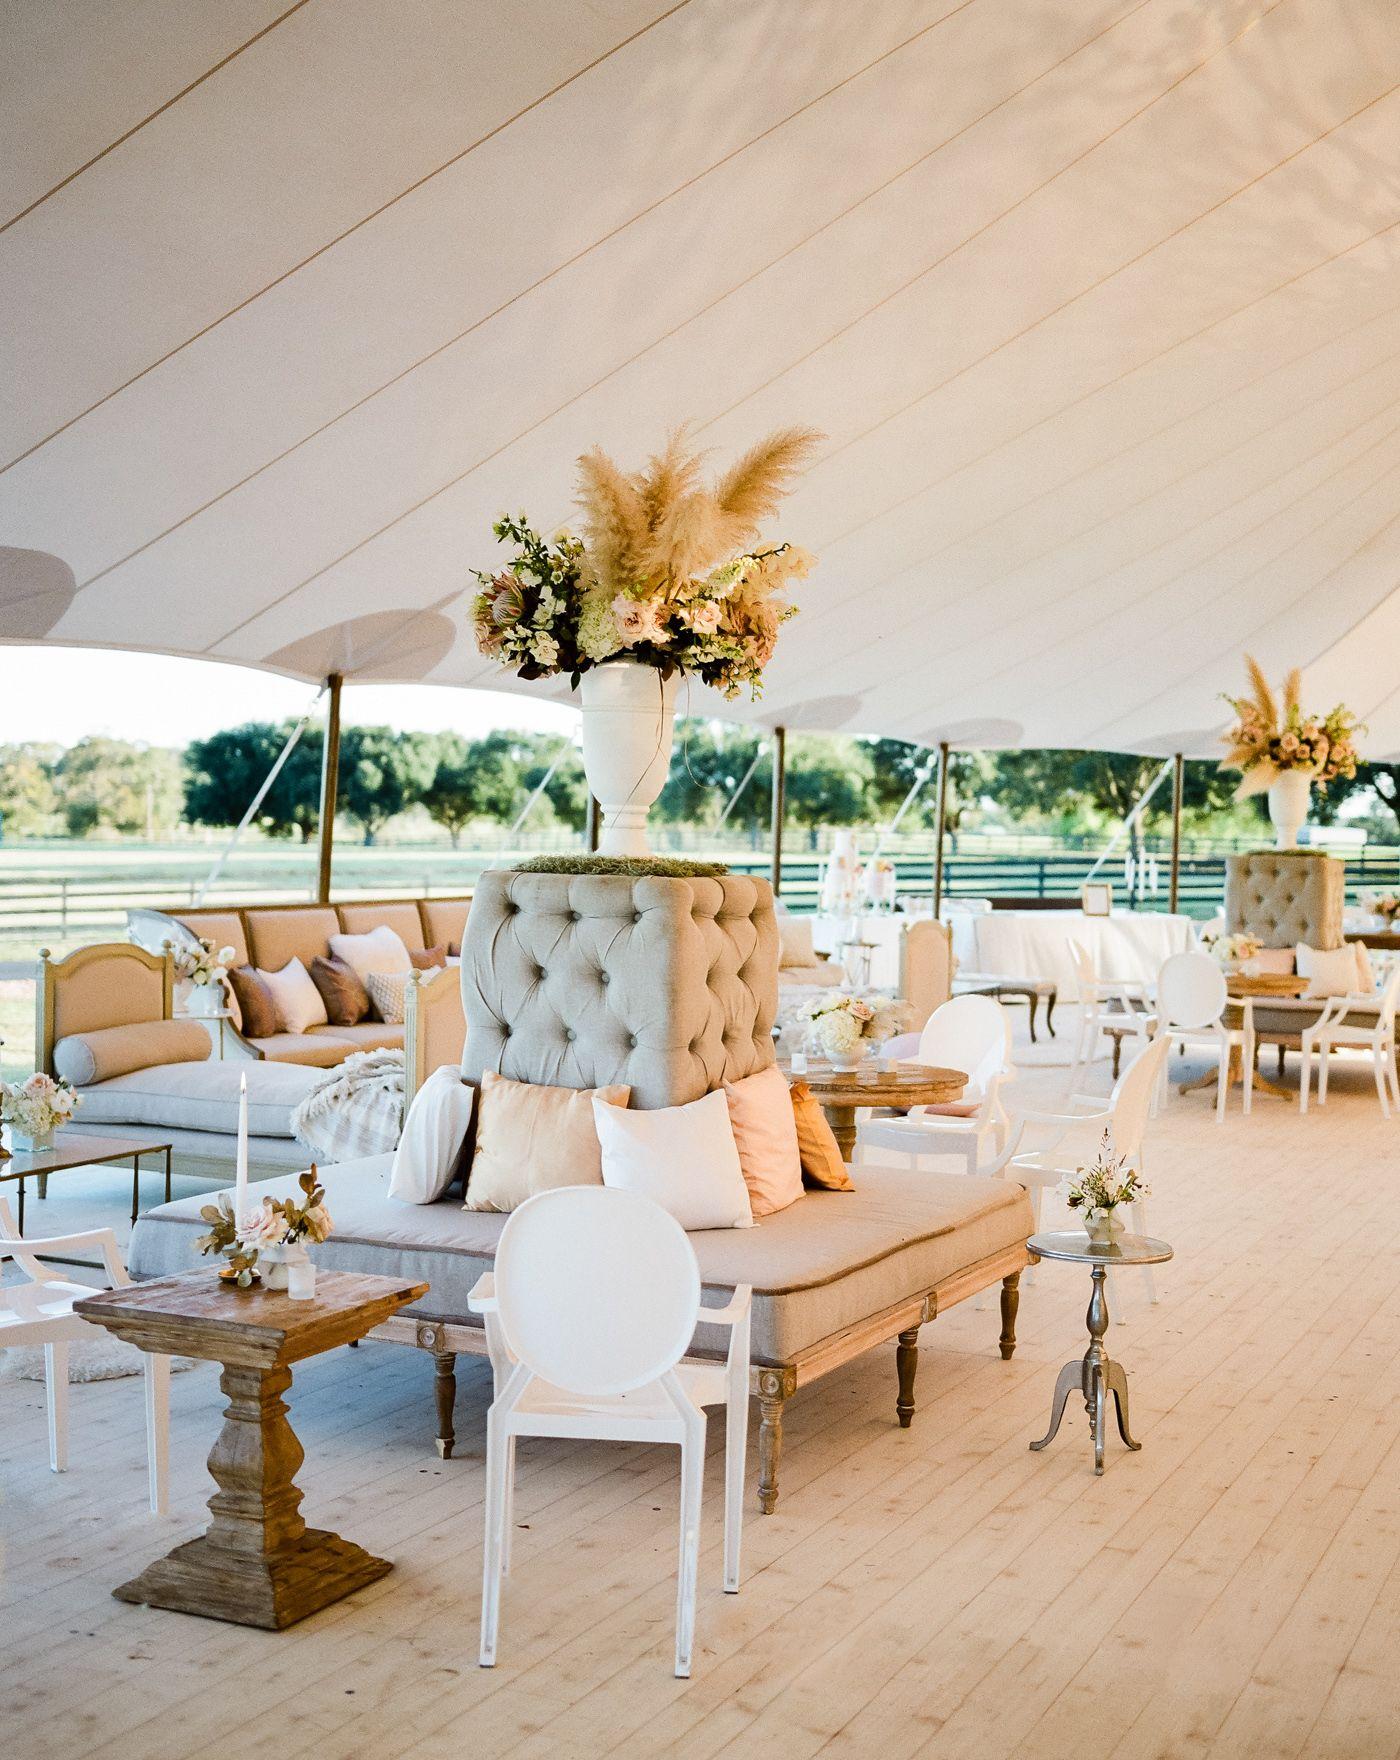 Wedding decorations checklist  Boho Lux Wedding Featured on MarthaWeddings  Photography by